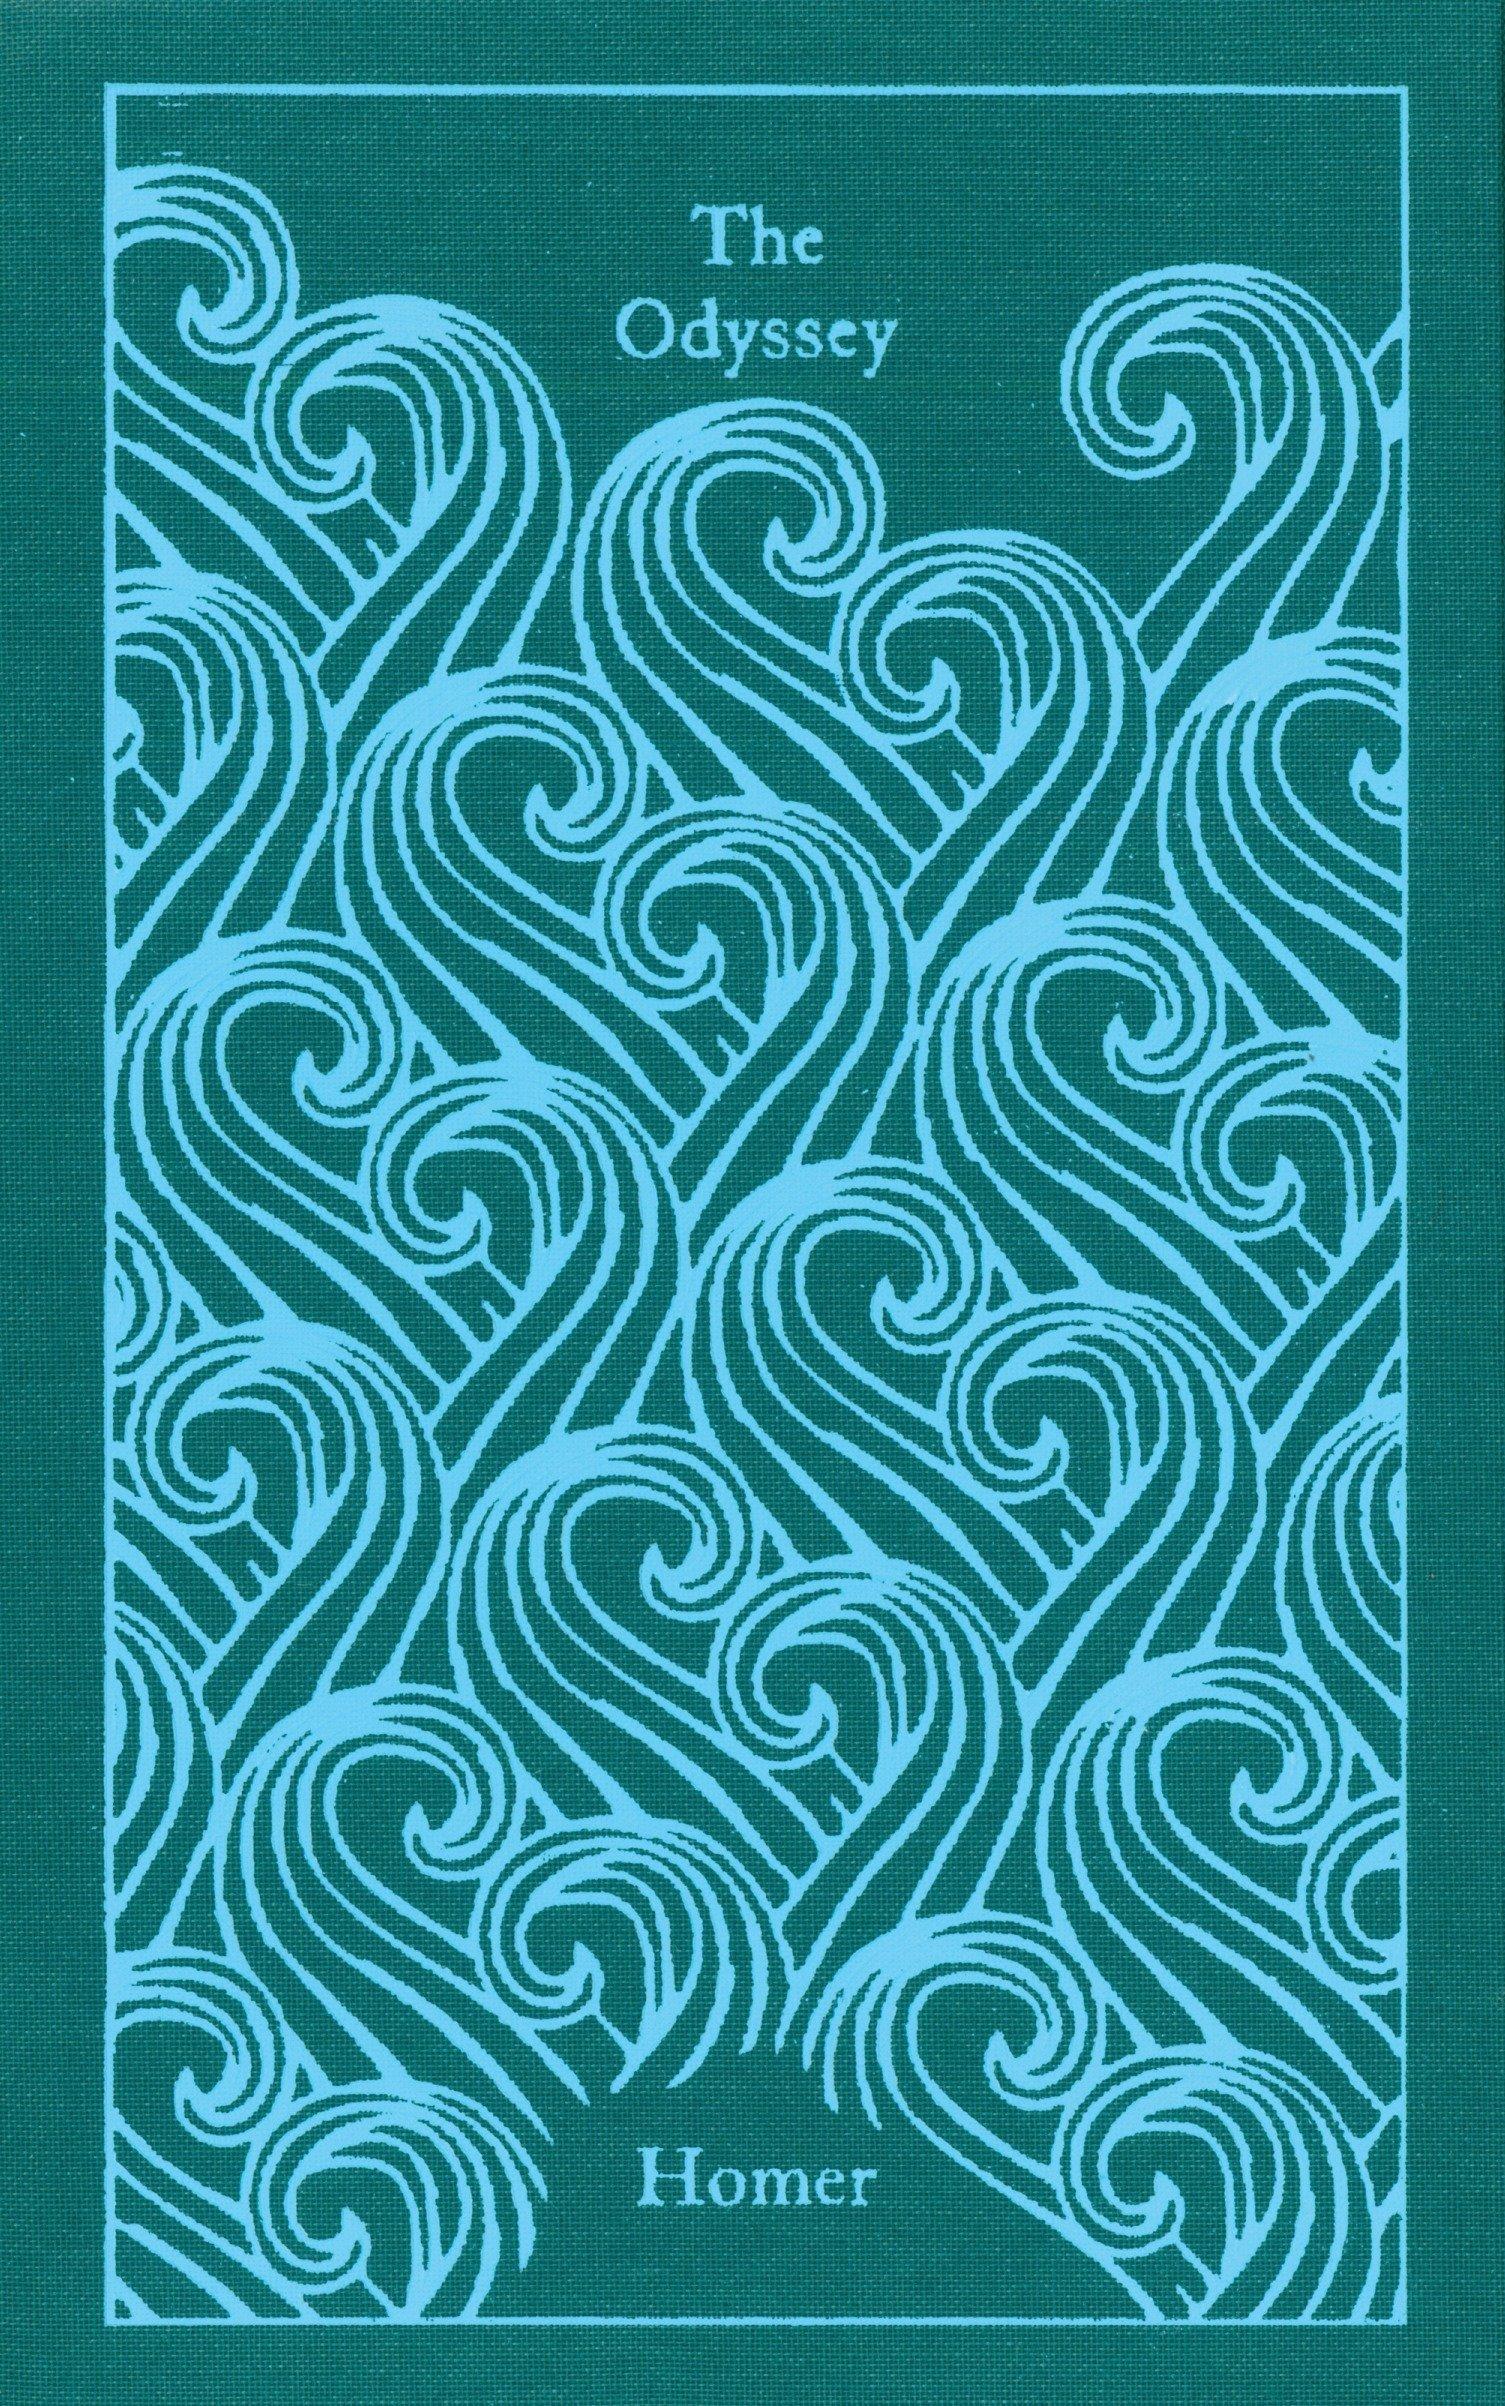 The Odyssey (Penguin Clothbound Classics) ebook